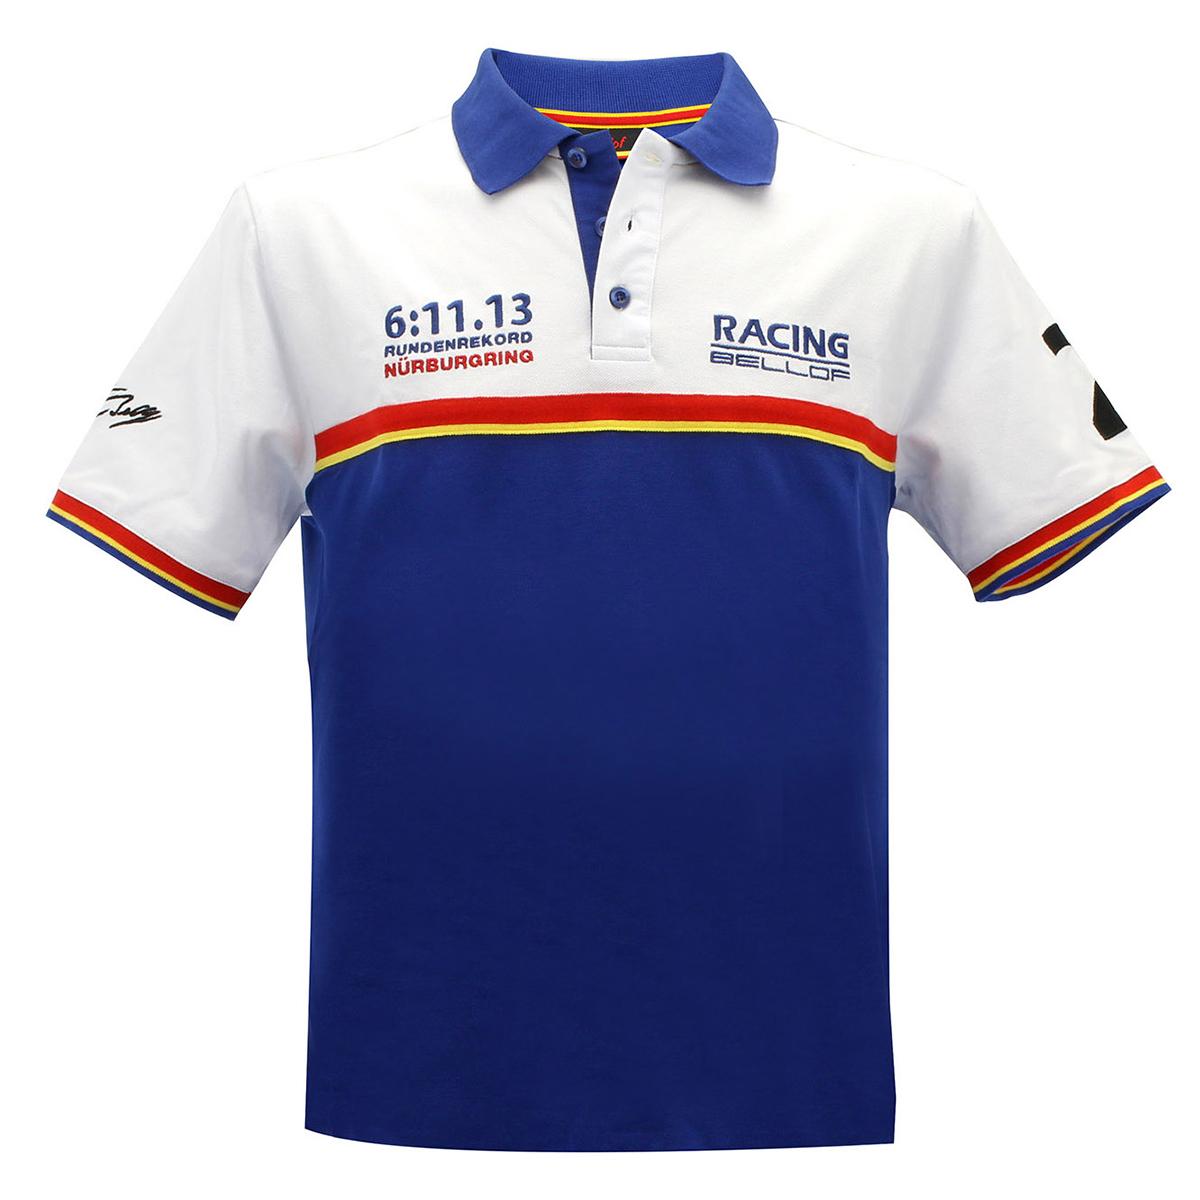 stefan-bellof-polo-shirt-rekordrunde-6-1113-min-front